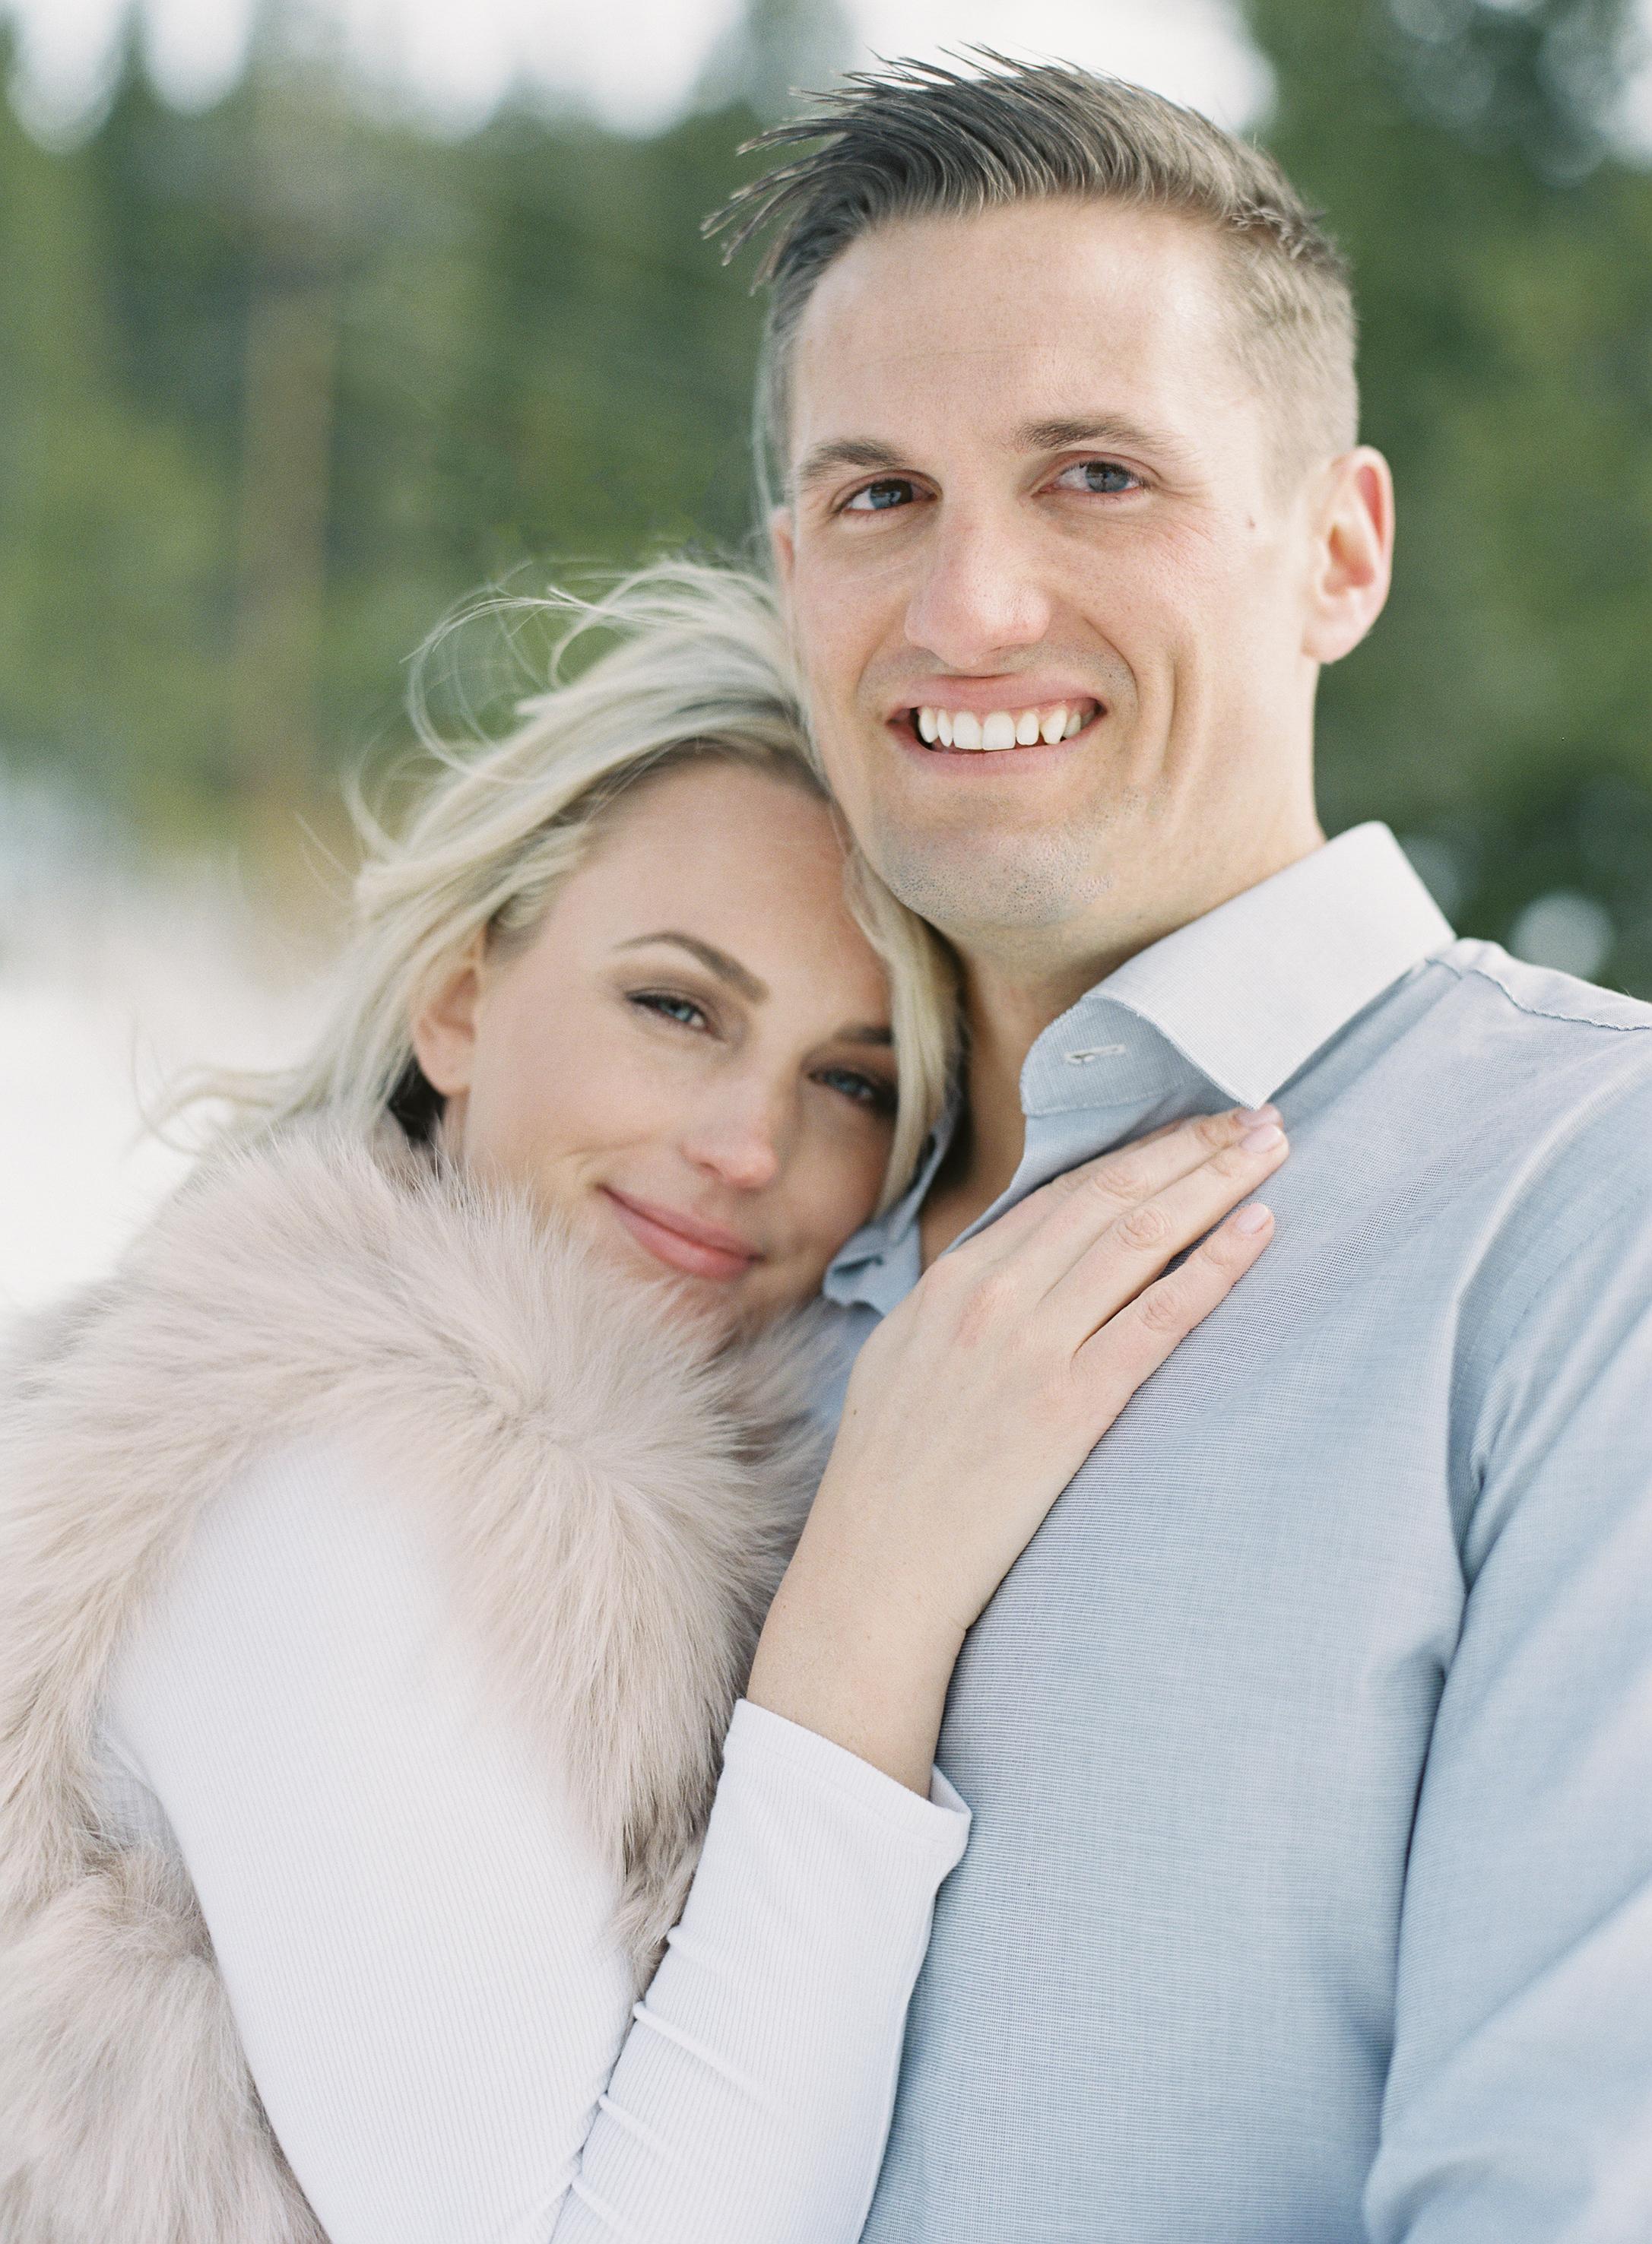 Sarah and John Engaged-Carrie King Photographer3.jpg